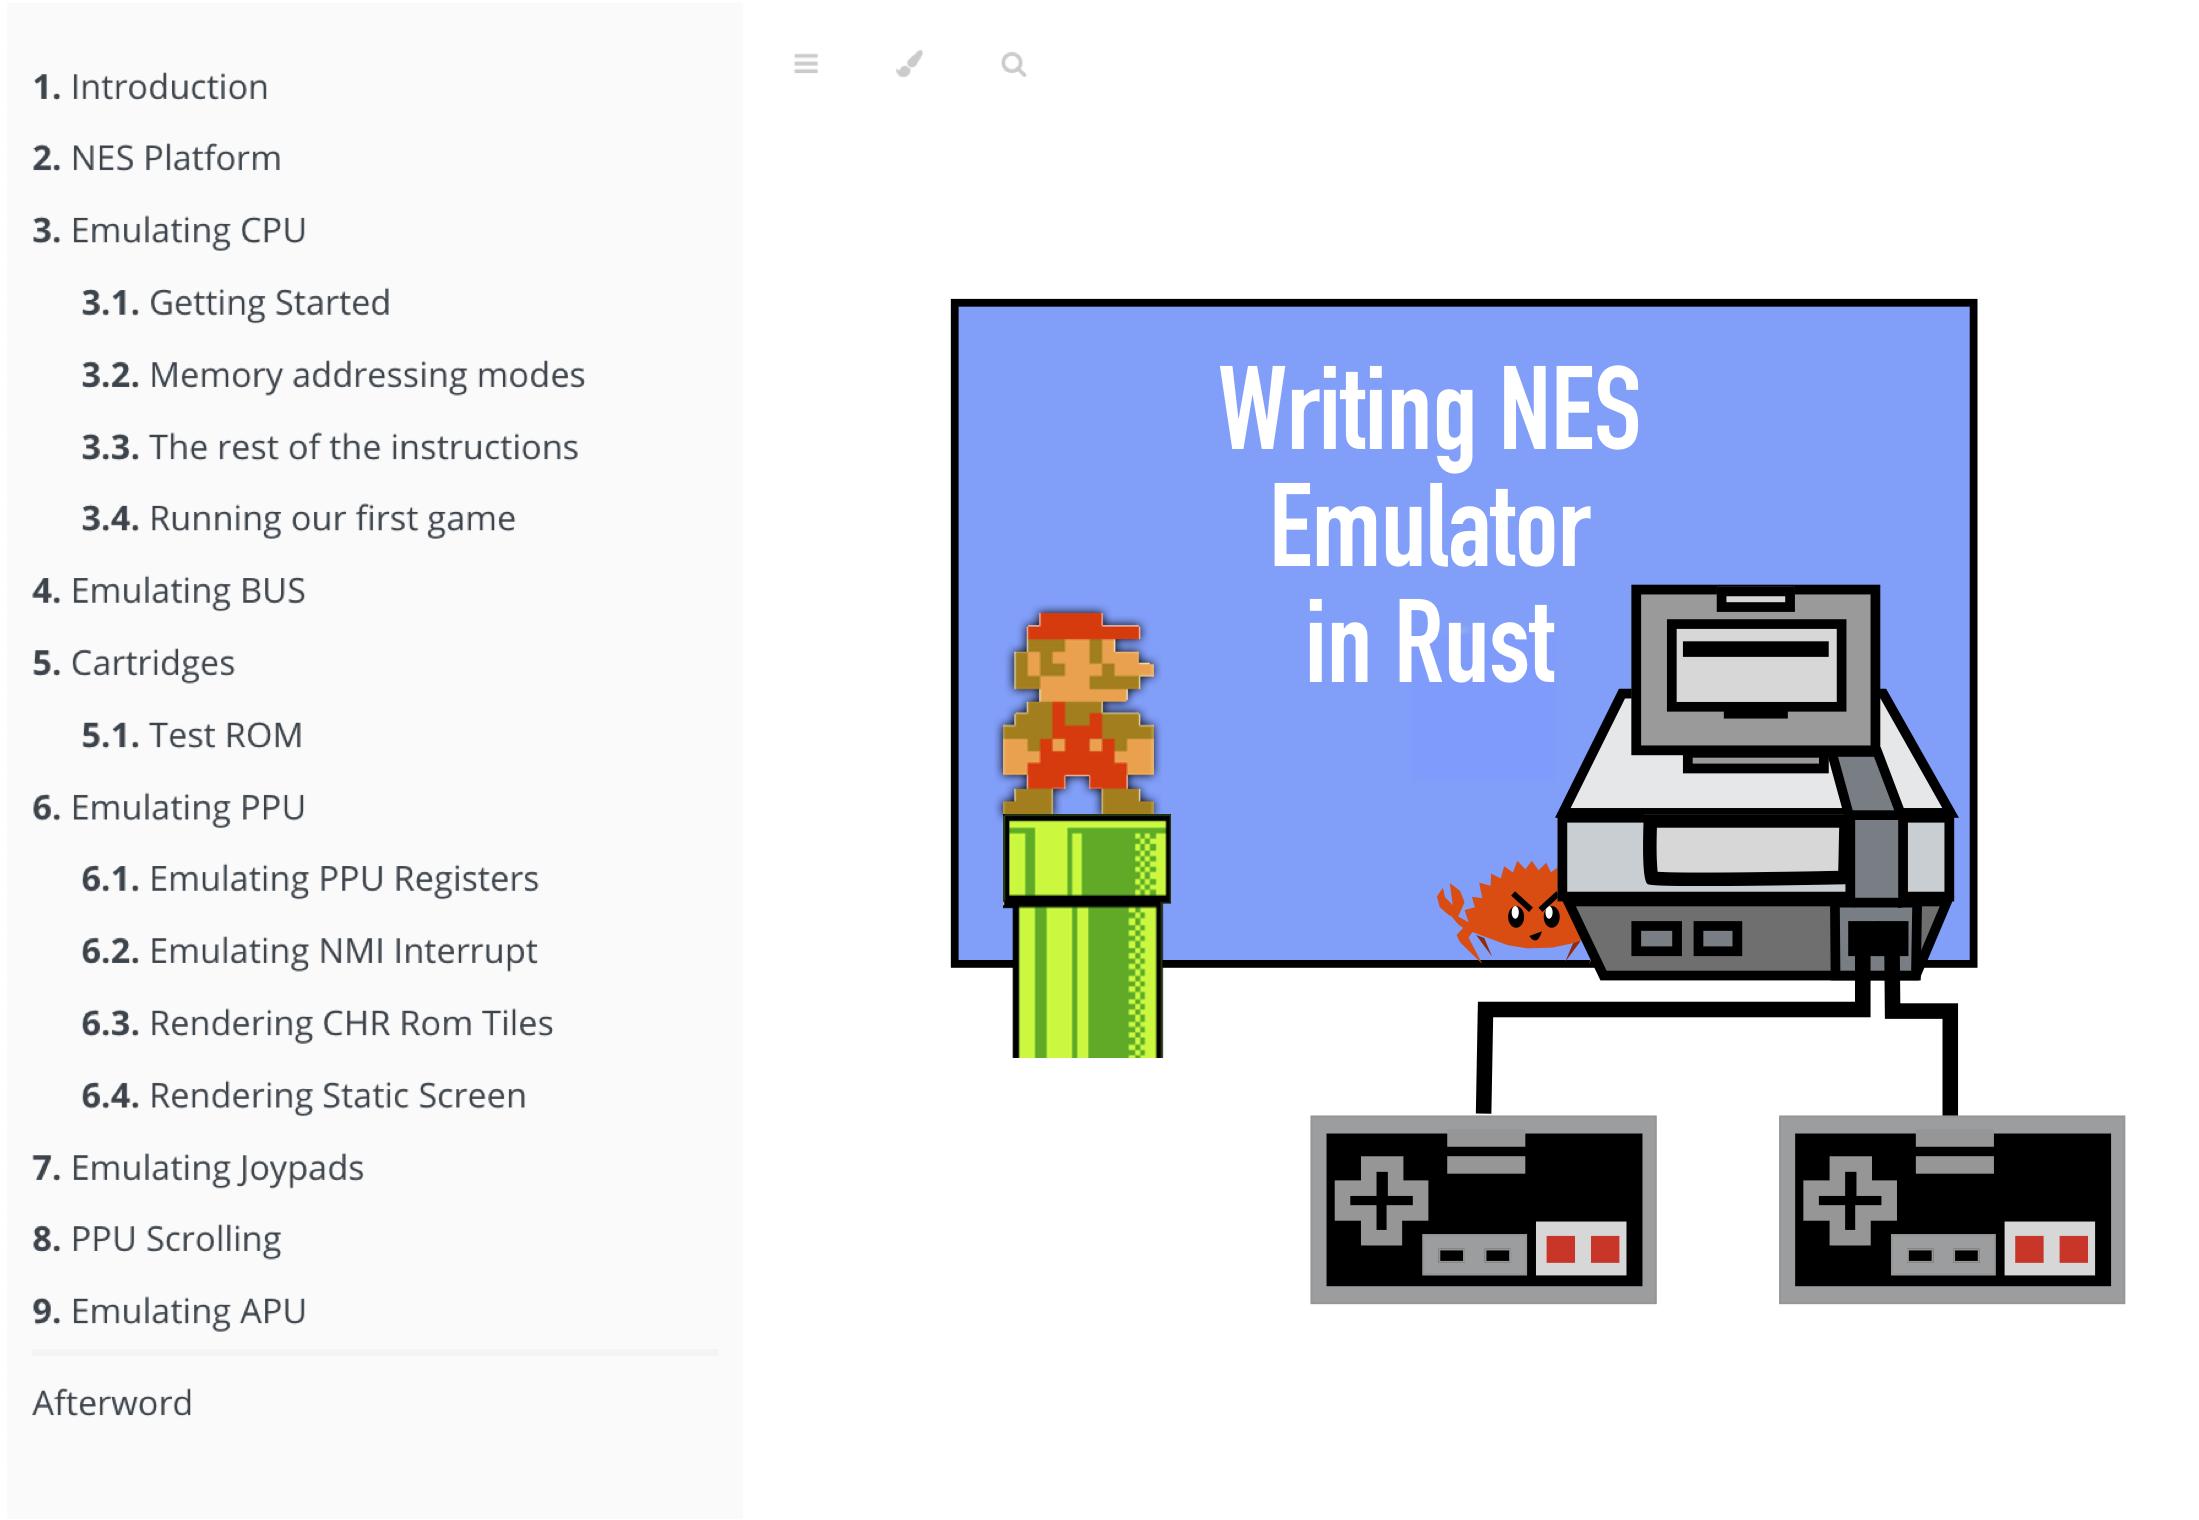 writing nes emulator